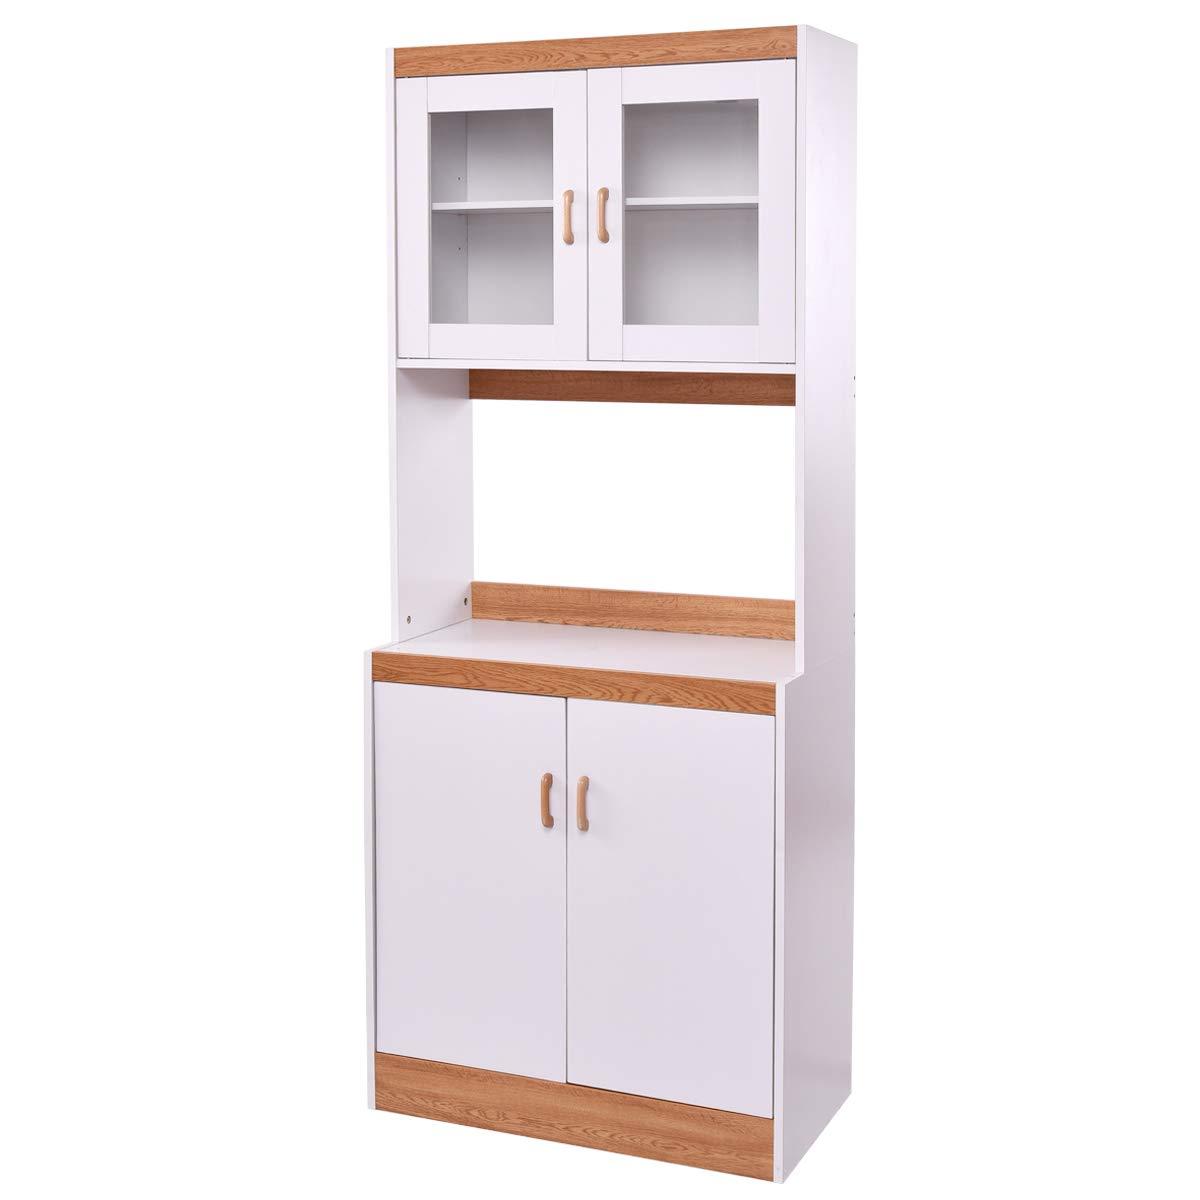 Amazon Com Giantex Kitchen Cabinet Microwave Counter Pantry